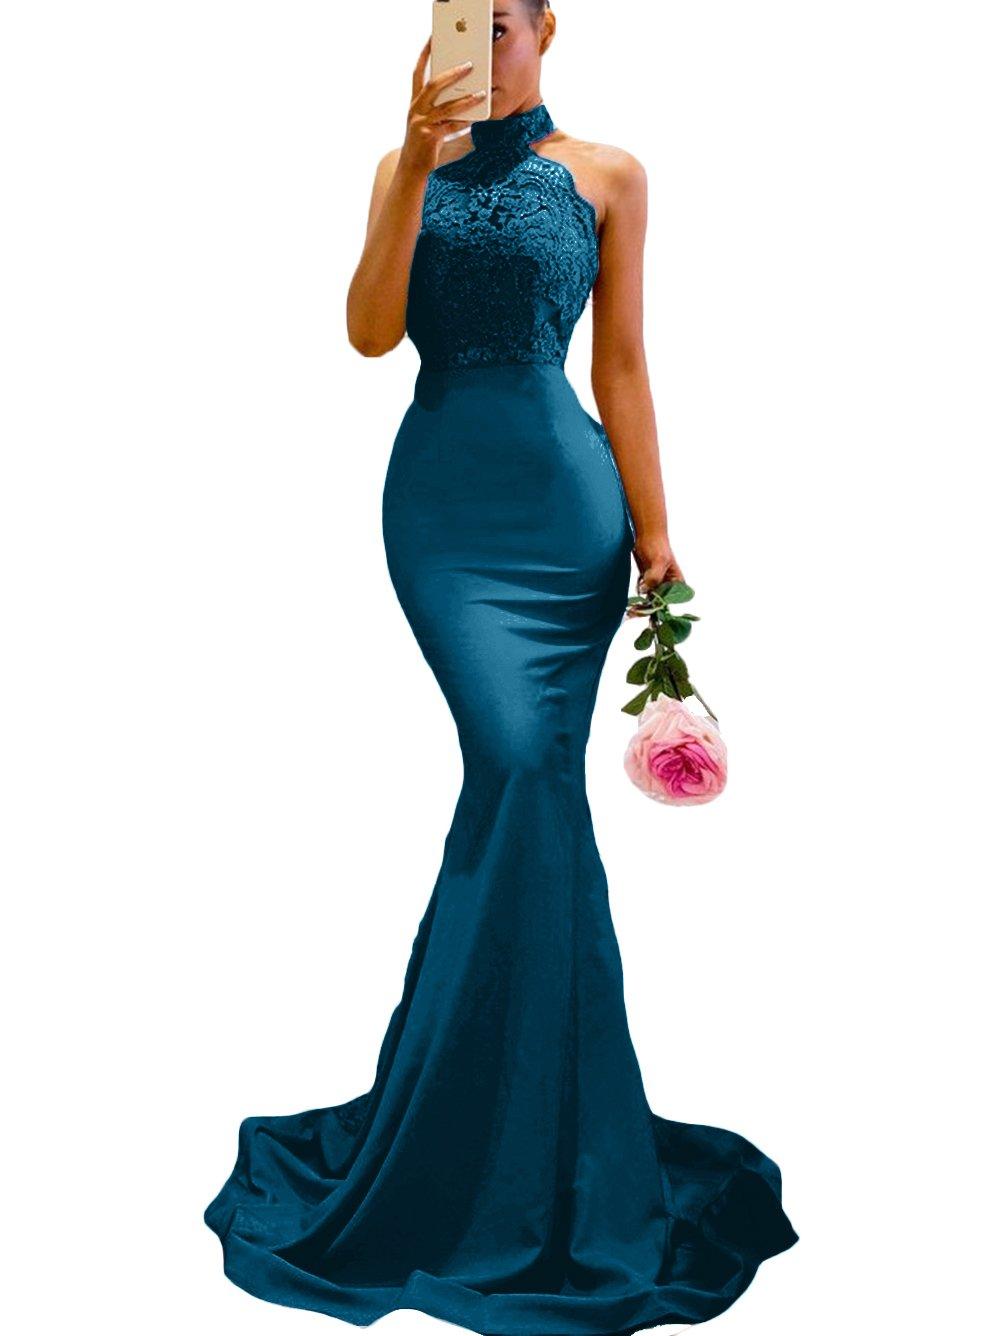 SDRESS Women's Lace Appliques Illusion Long Mermaid Skirt Bridesmaid Prom Dress Teal Blue Size 2